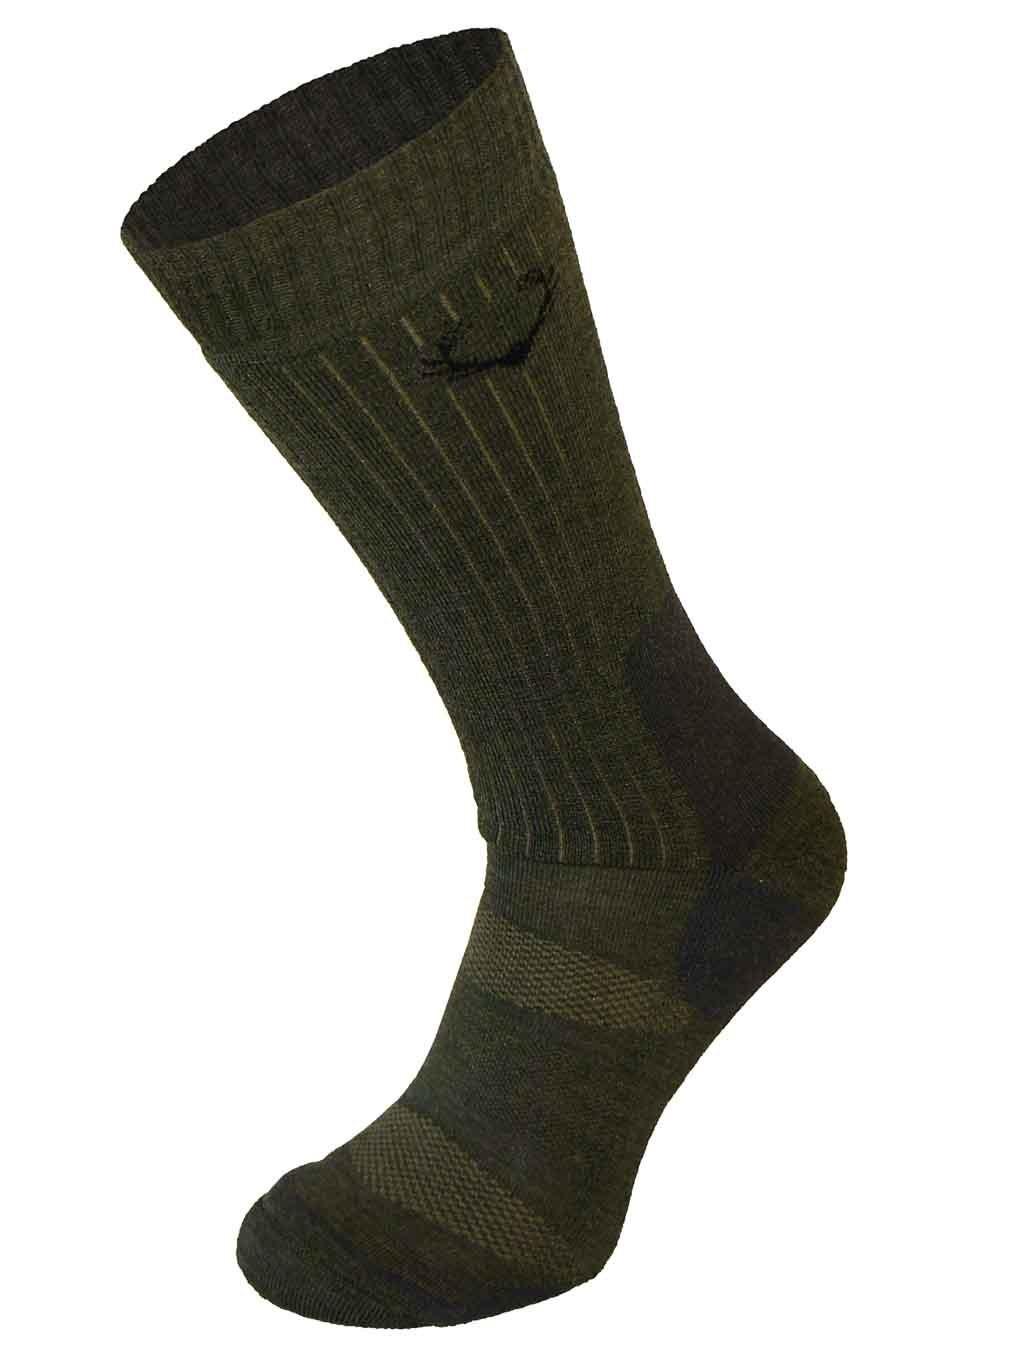 Midweight Merino Wool Shooting and Hunting Socks